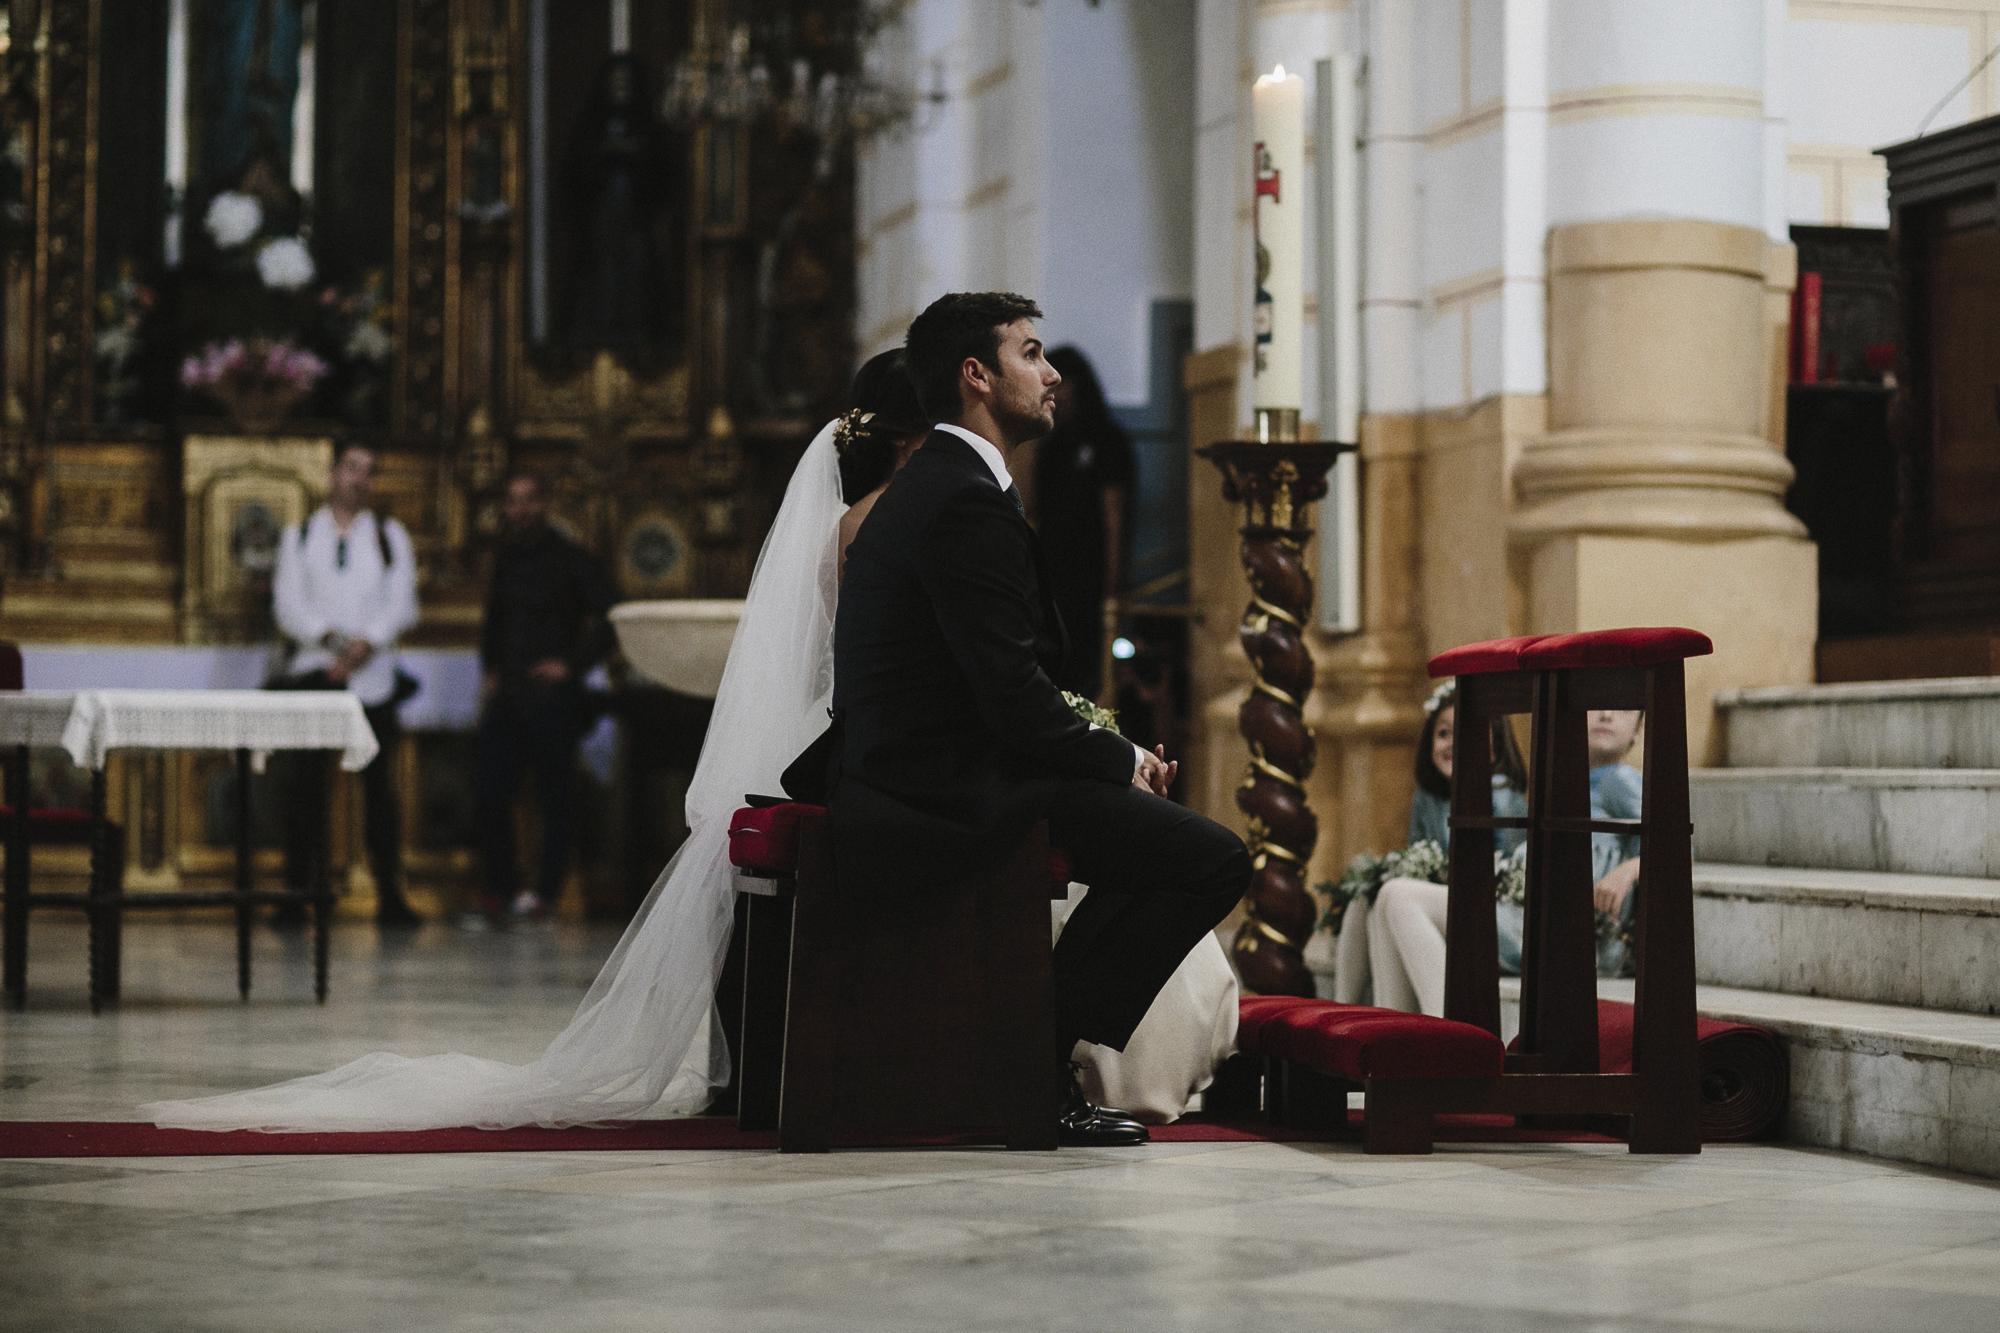 alfonso_flores_destination_wedding_photogrpaher_españa-52.jpg